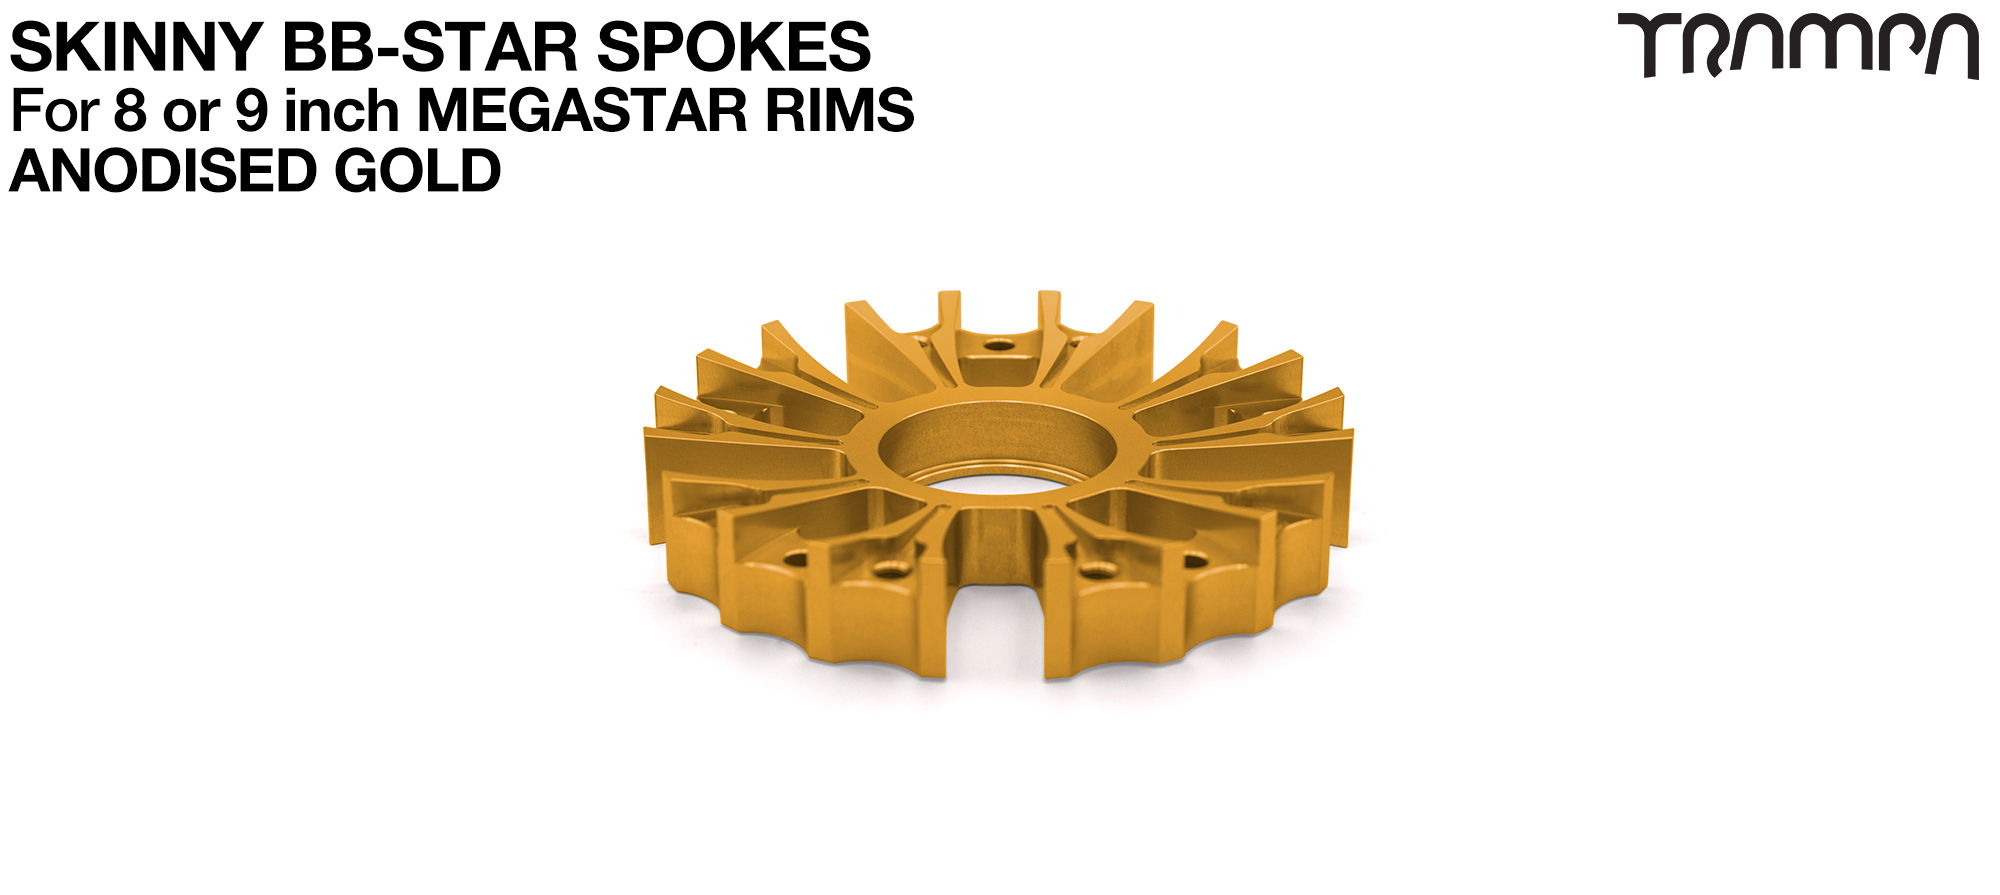 BB Star Spoke for 8 Inch DEEP-DISH MEGASTAR Rim - CNC Precision milled - GOLD